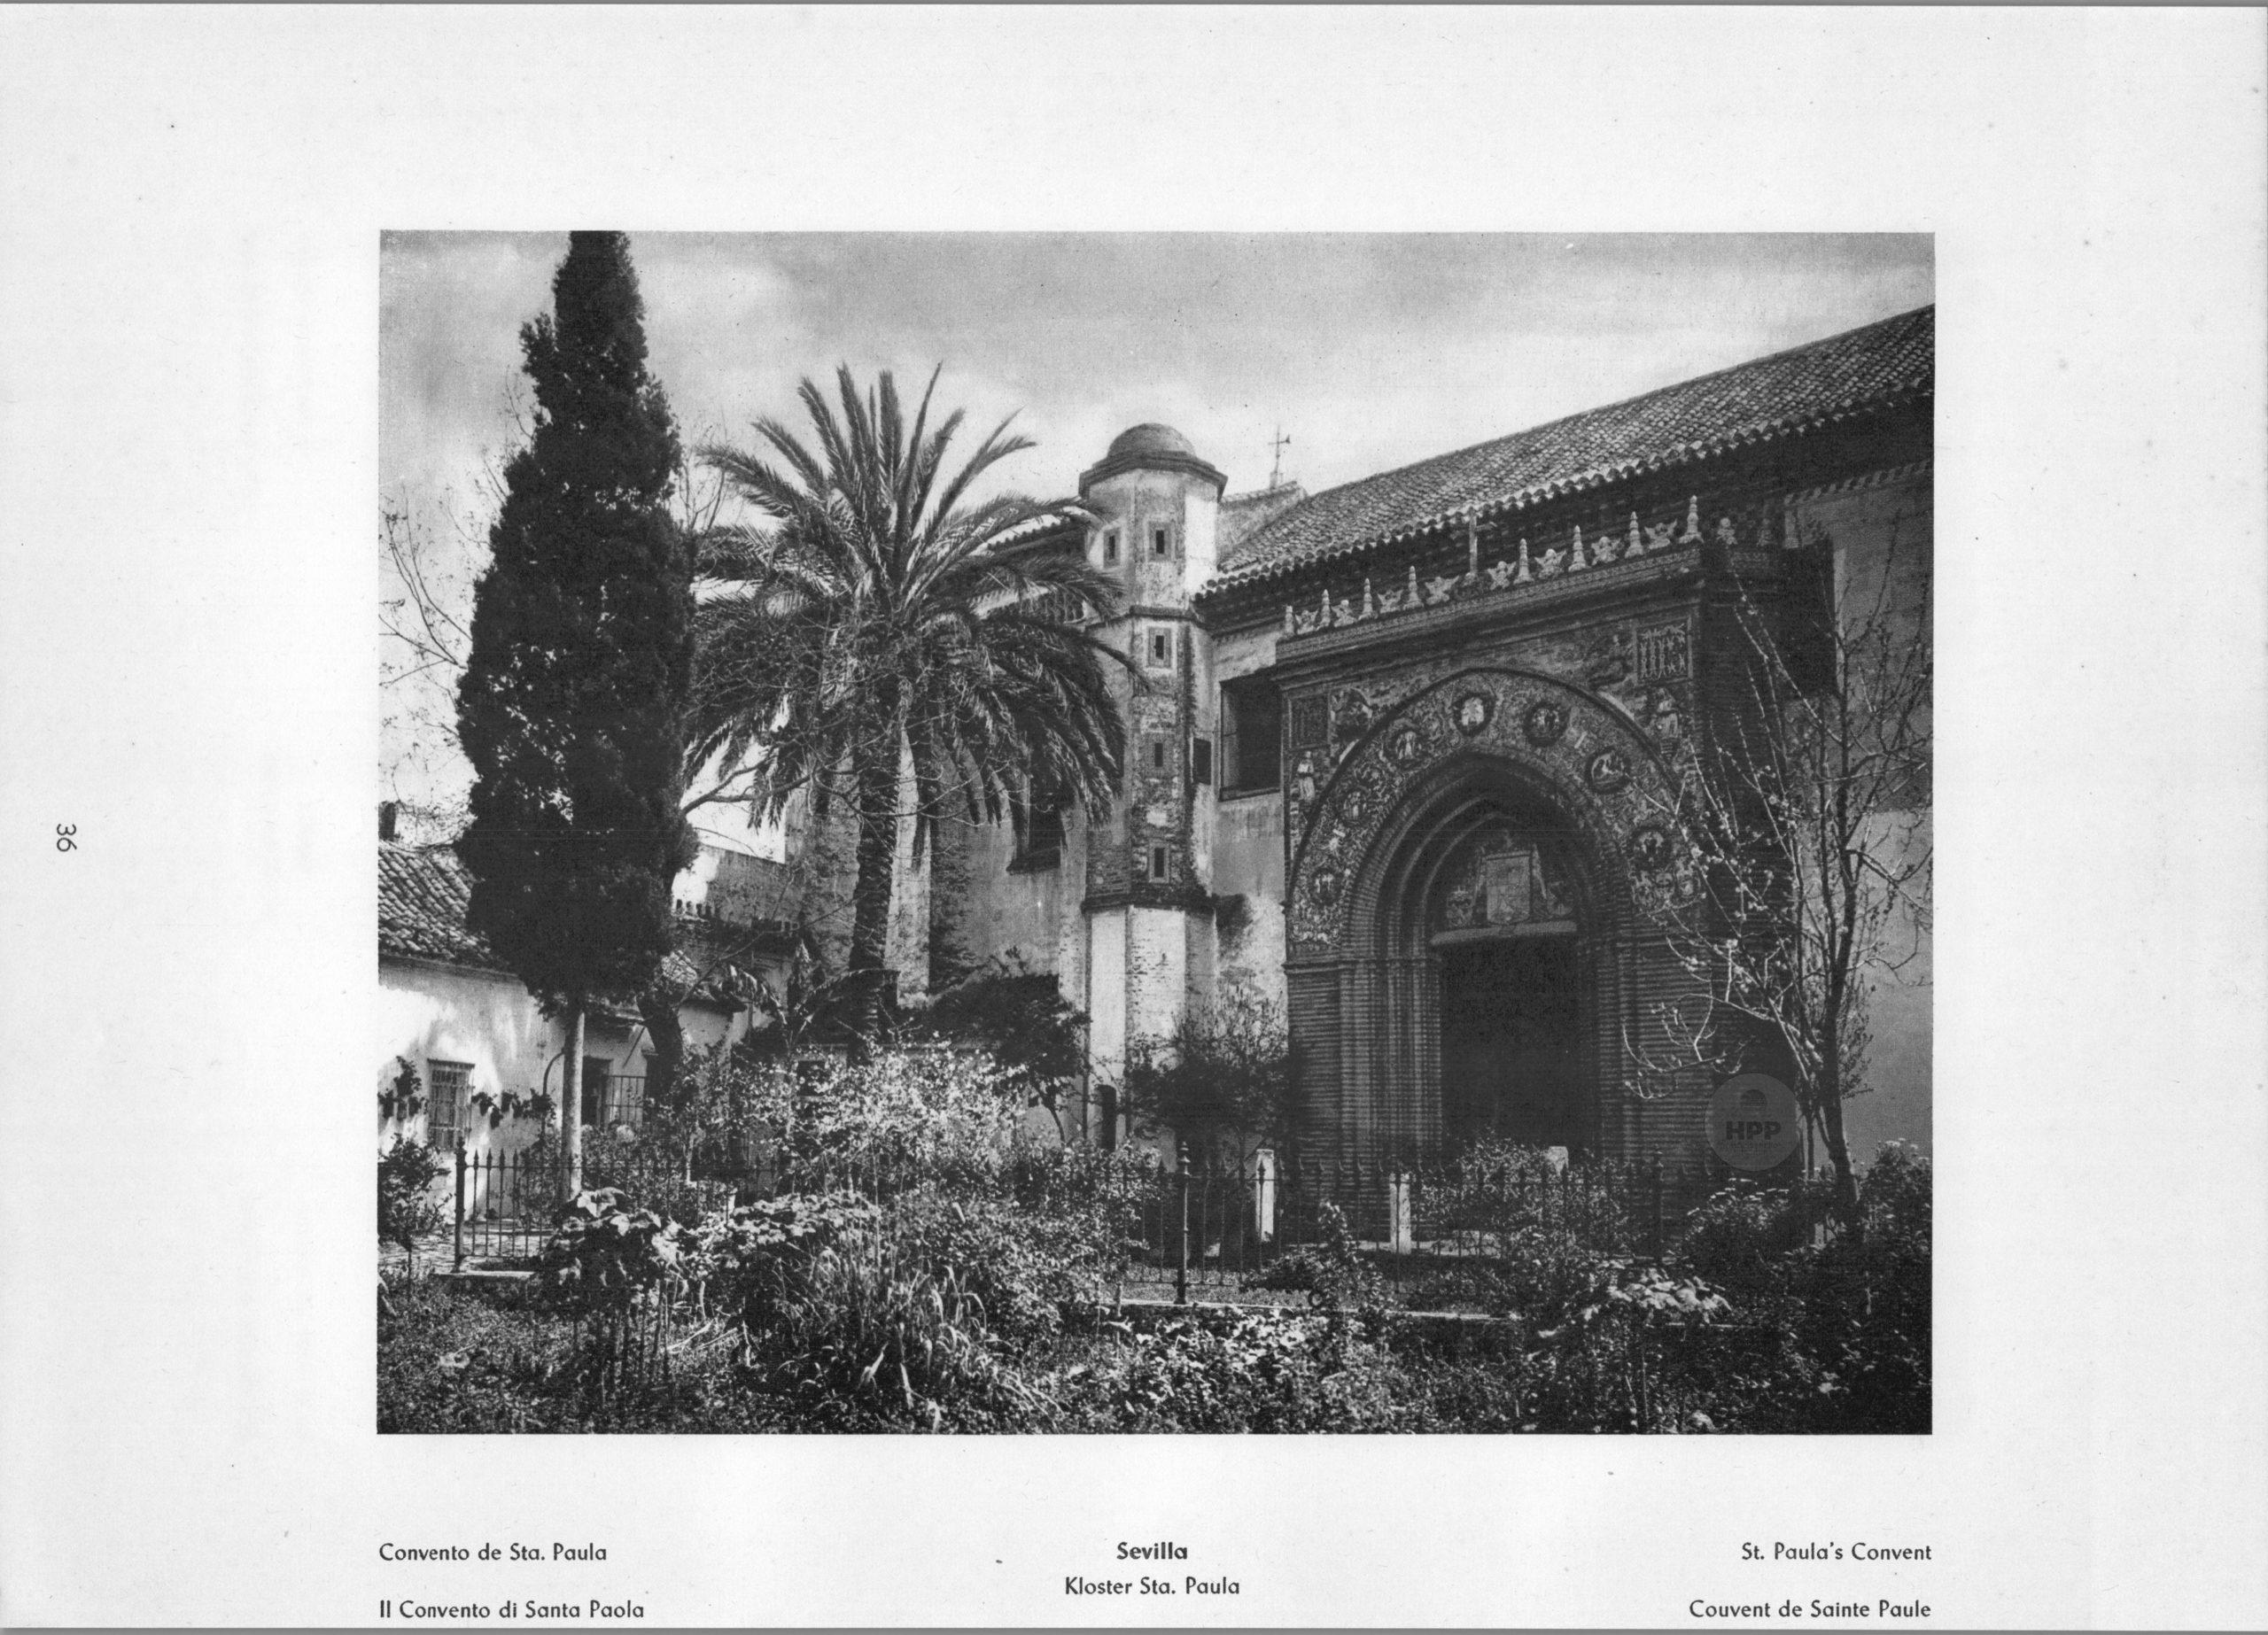 Sevilla - St. Paula's Convent